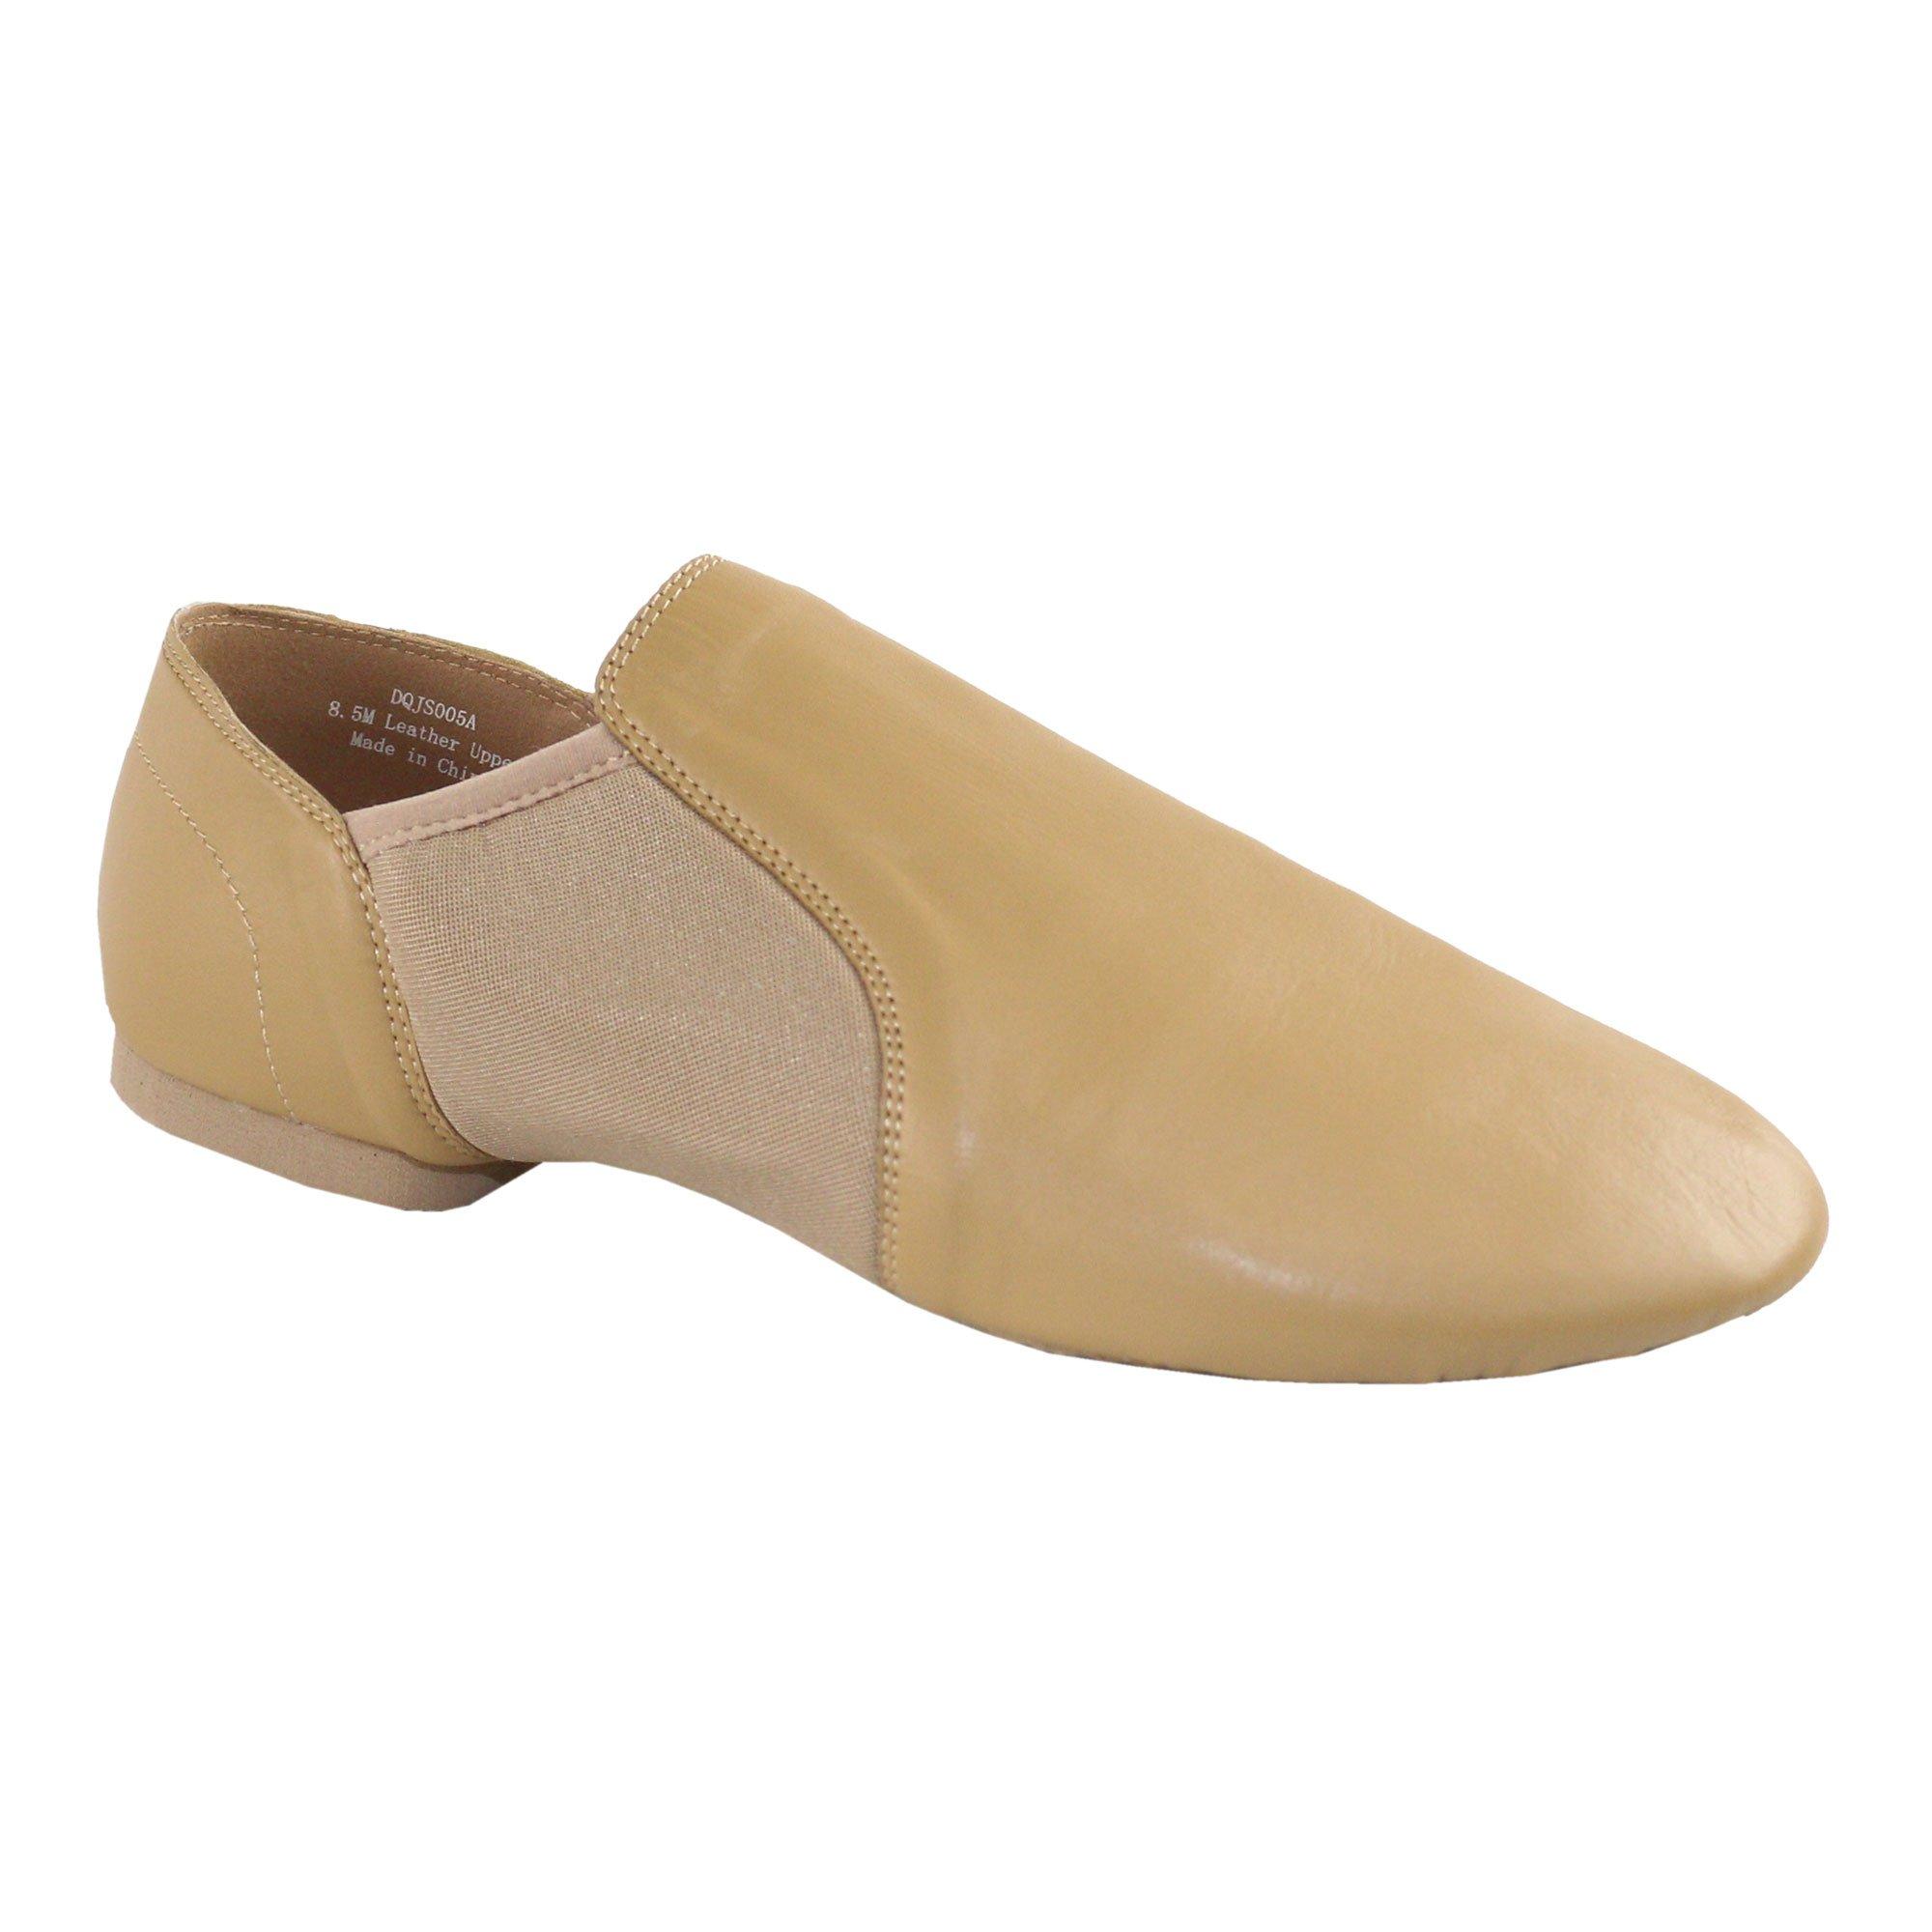 49f6c996b Shoes: sneakers, ballet shoes, dance shoes, pointe shoes, jazz shoes ...